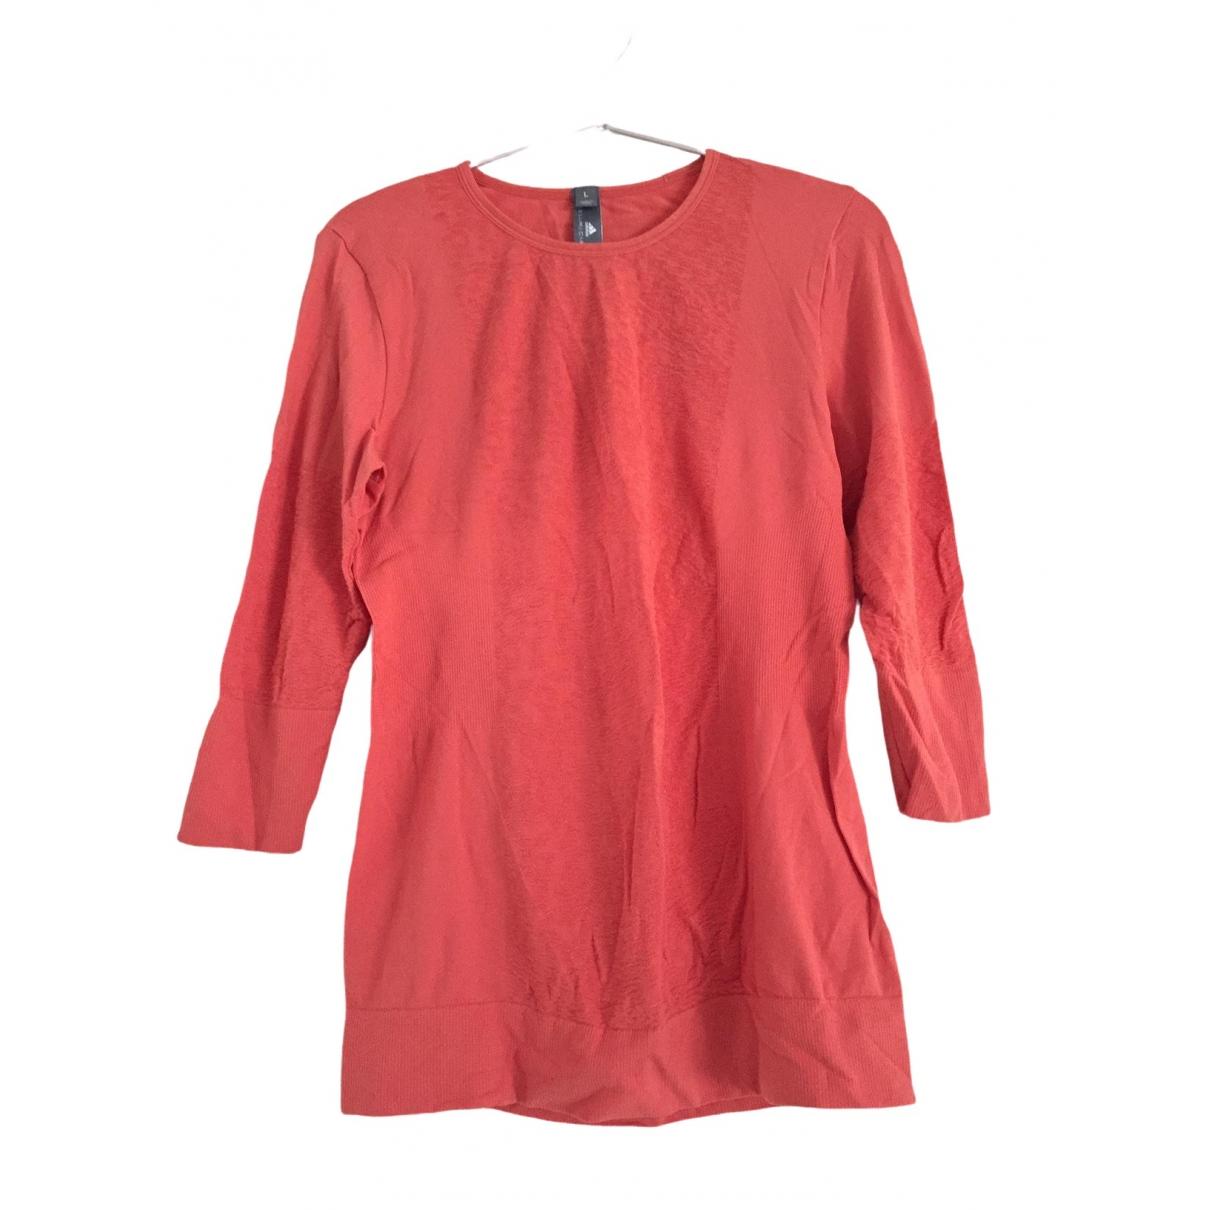 Stella Mccartney Pour Adidas \N Orange  top for Women L International